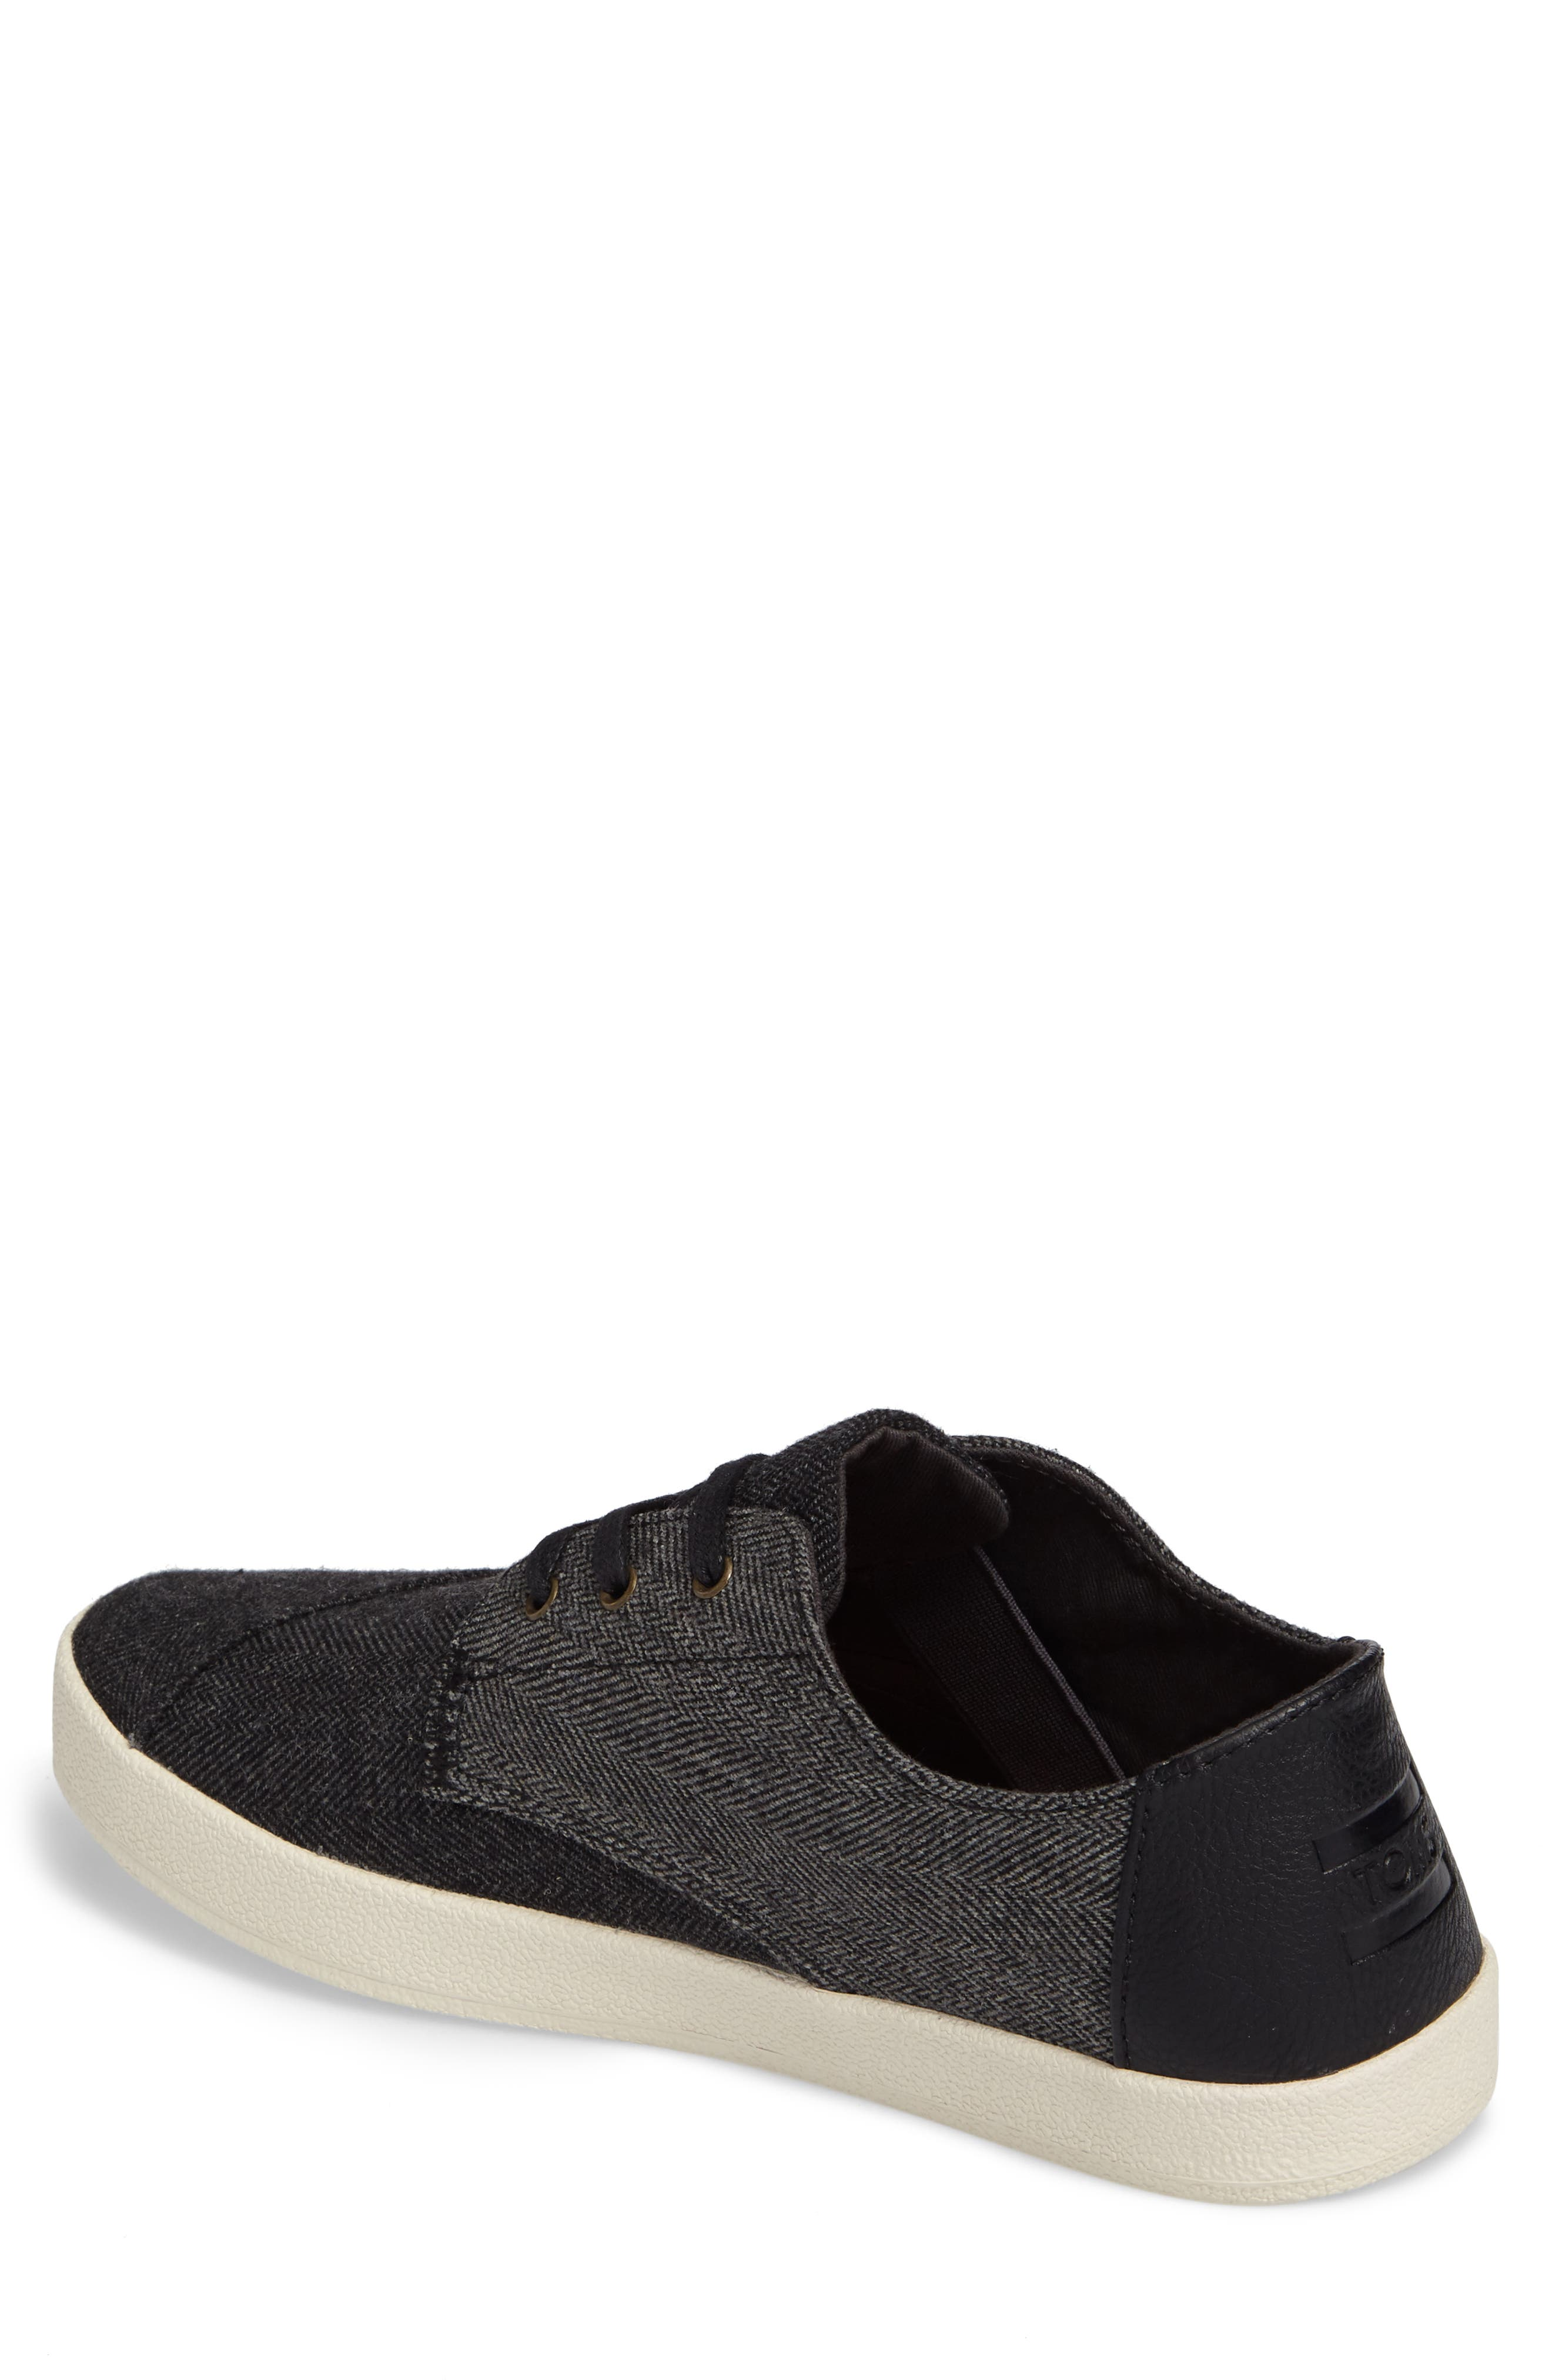 'Paseo' Sneaker,                             Alternate thumbnail 2, color,                             Black/ Grey